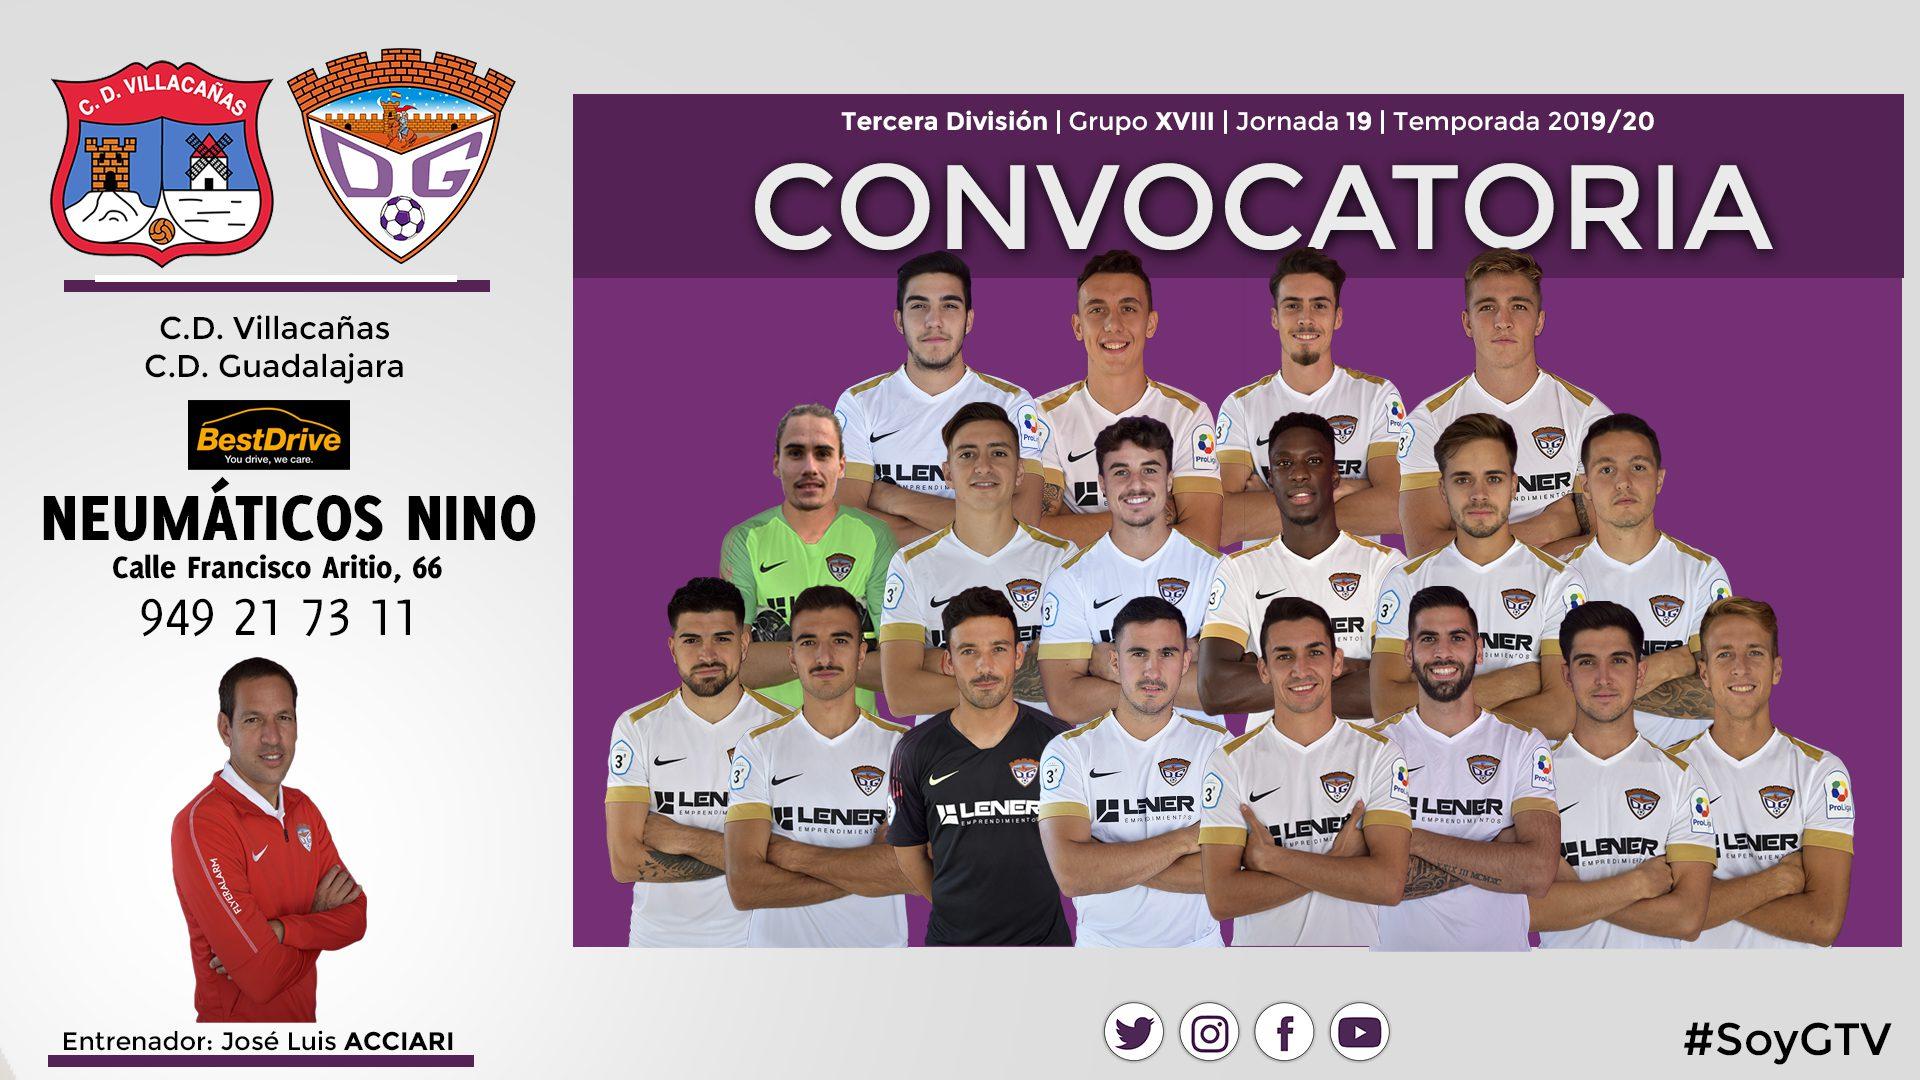 Convocatoria del C.D. Guadalajara para el partido ante el C.D. Villacañas